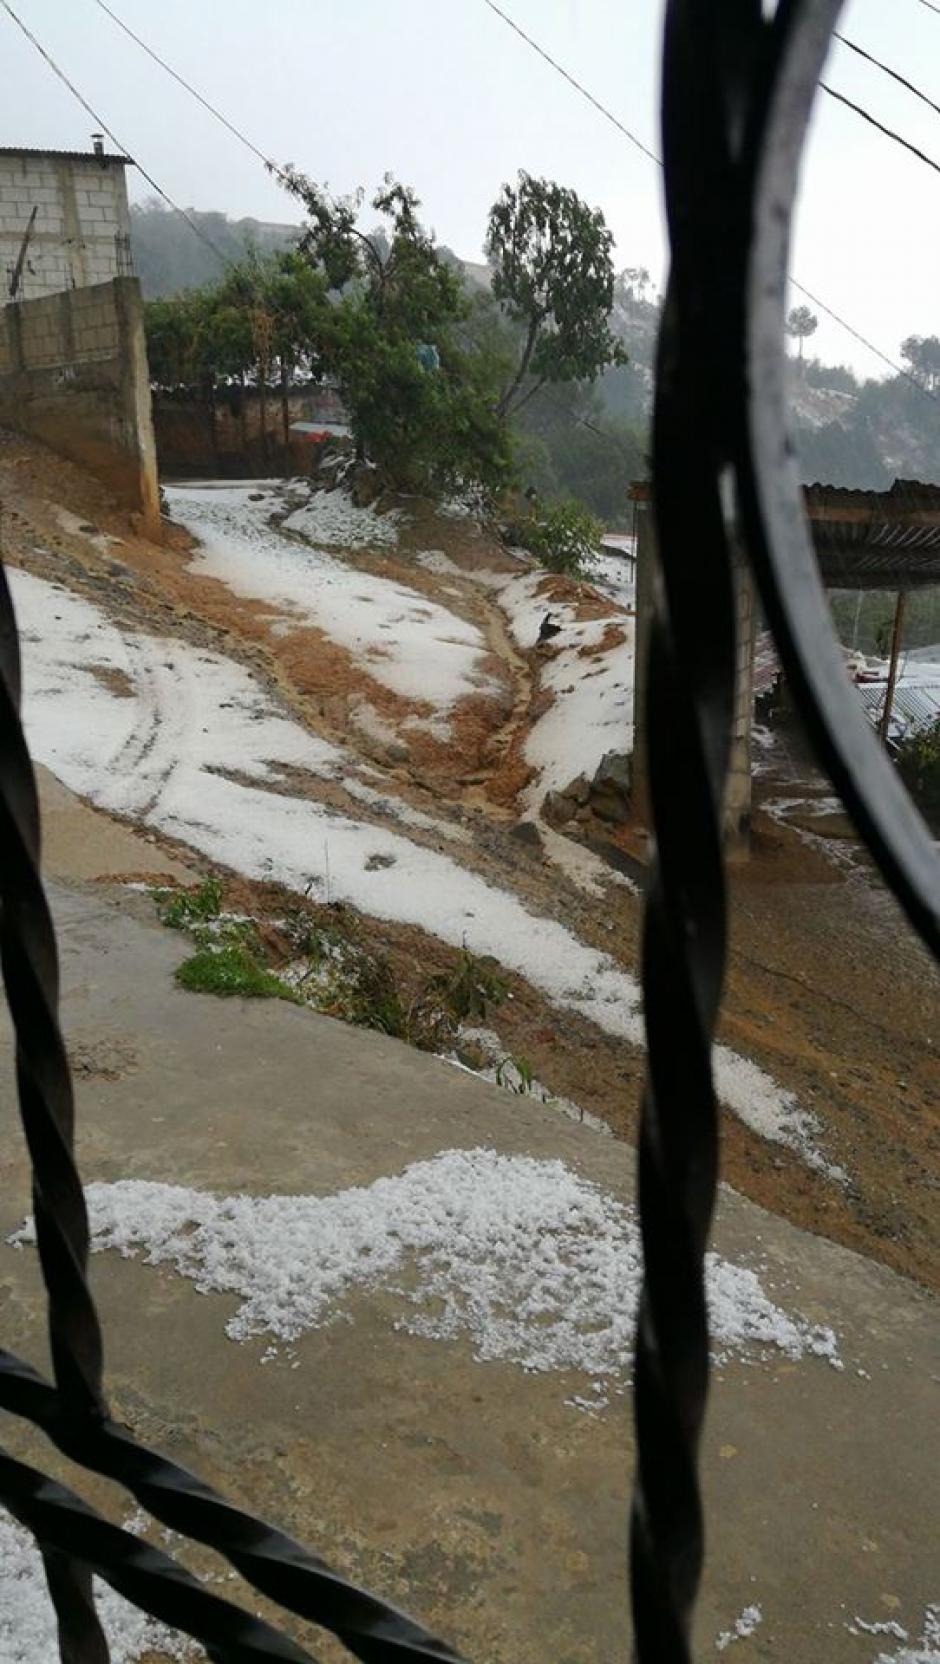 El frío intenso en el municipio provocó que se formara granizo. (Foto: elclimaenguatemala.blogspot.com)